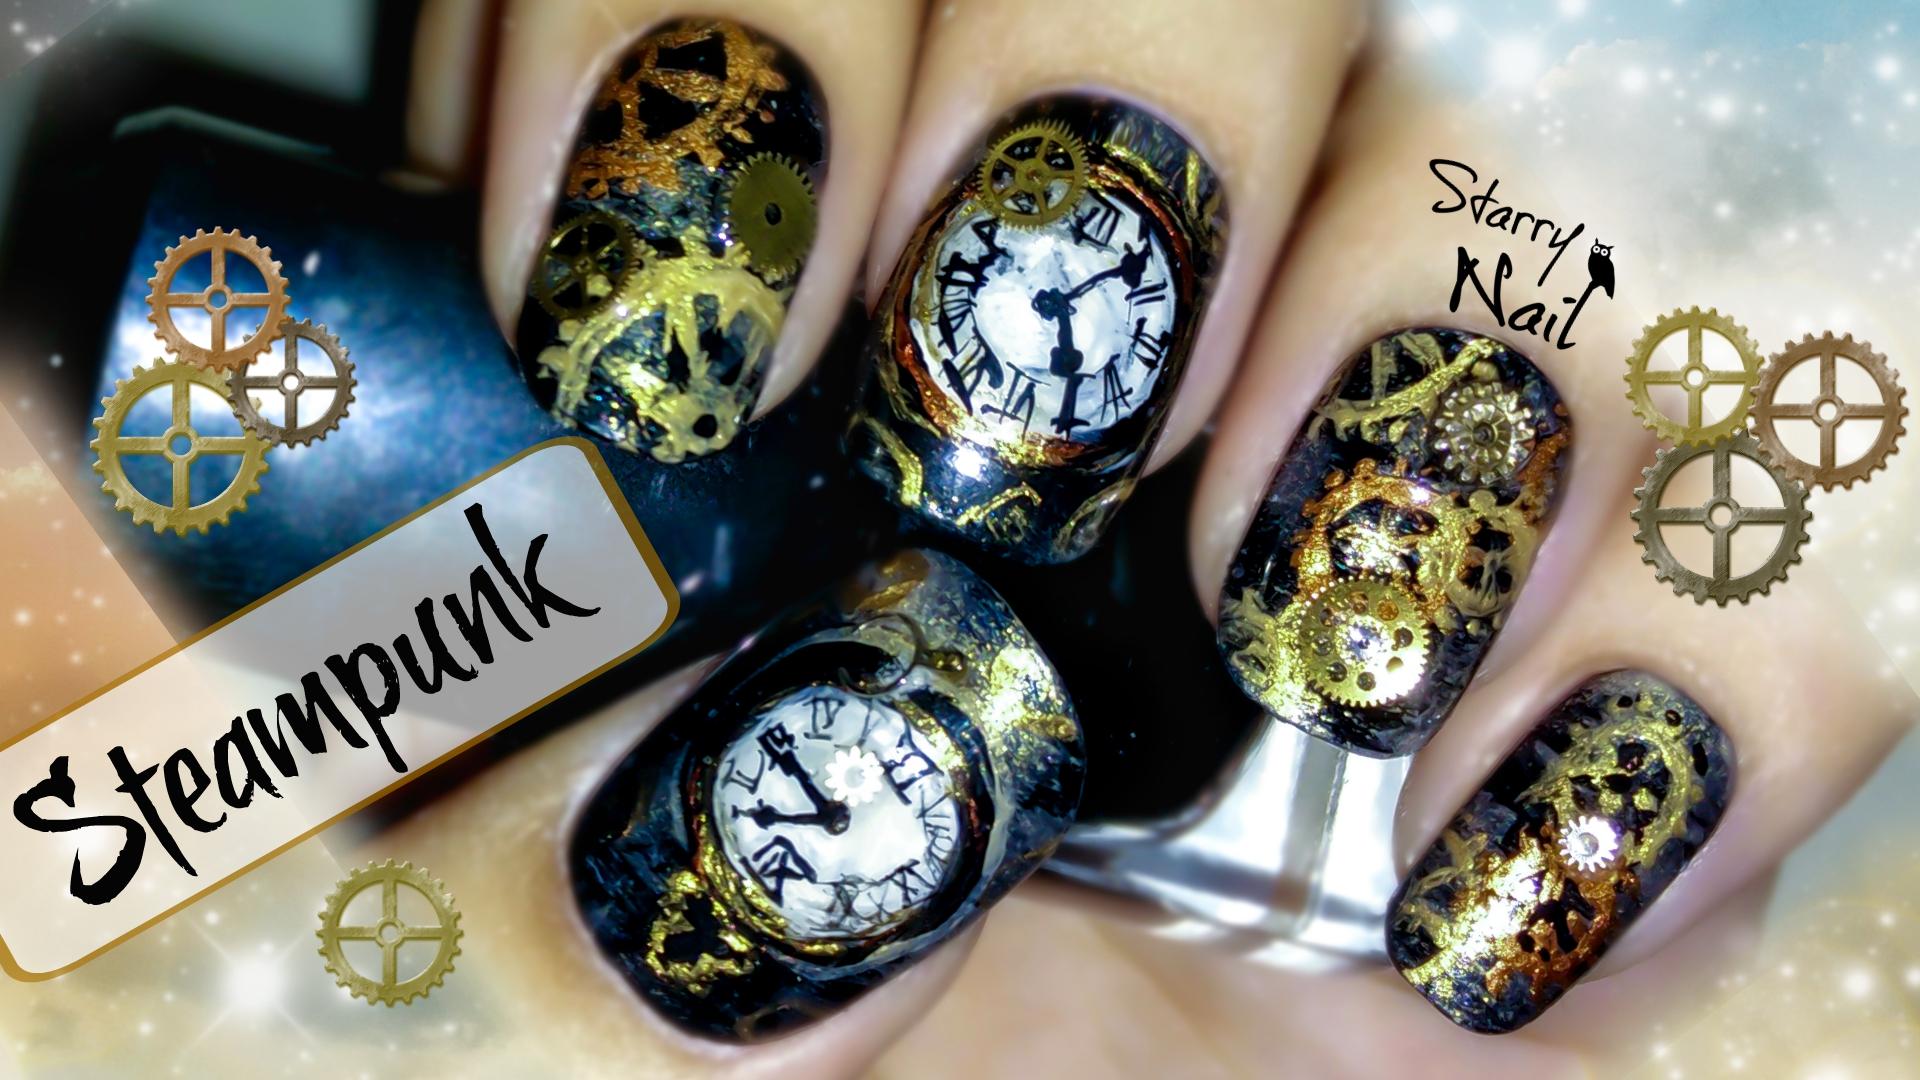 Steampunk nail art starrynail 30 july 2015 1920 1080 steampunk nail art prinsesfo Images